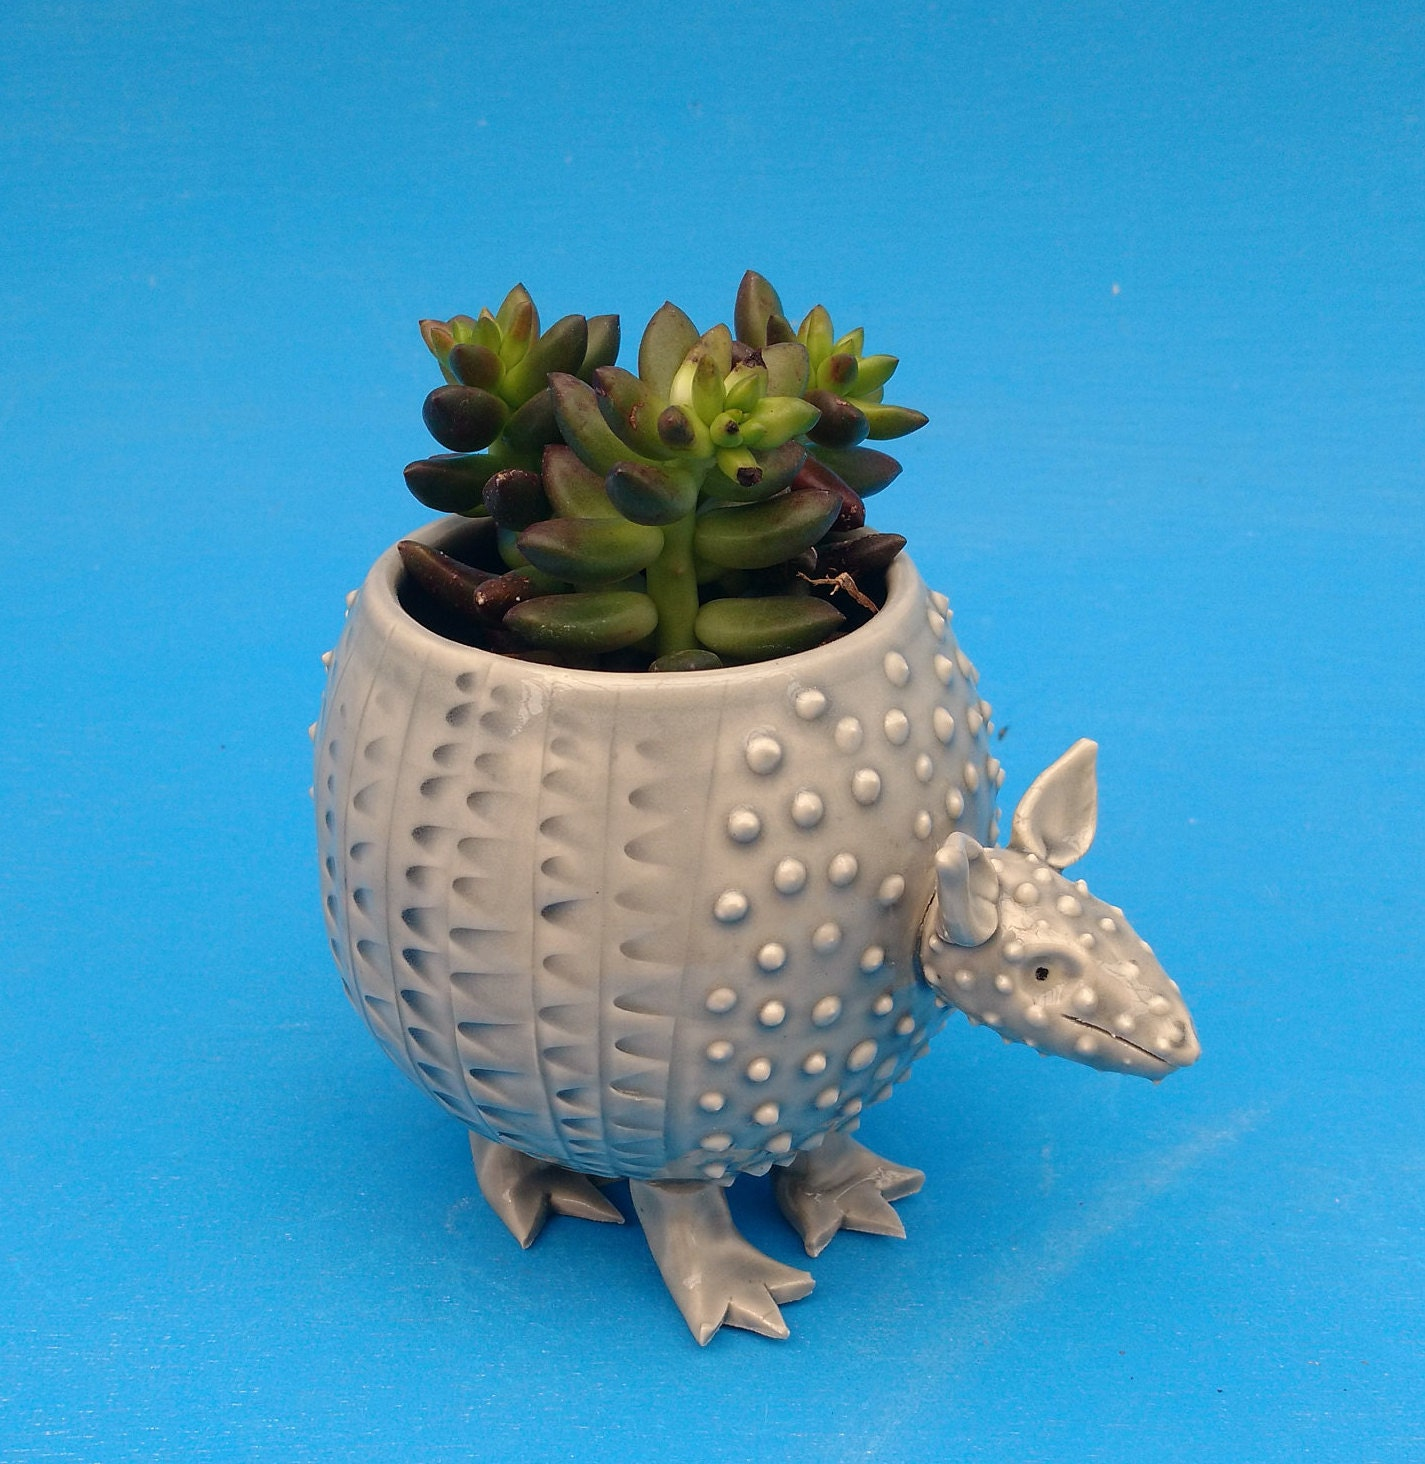 Small Armadillo Planter Succulents Air Plants | Etsy - photo#31